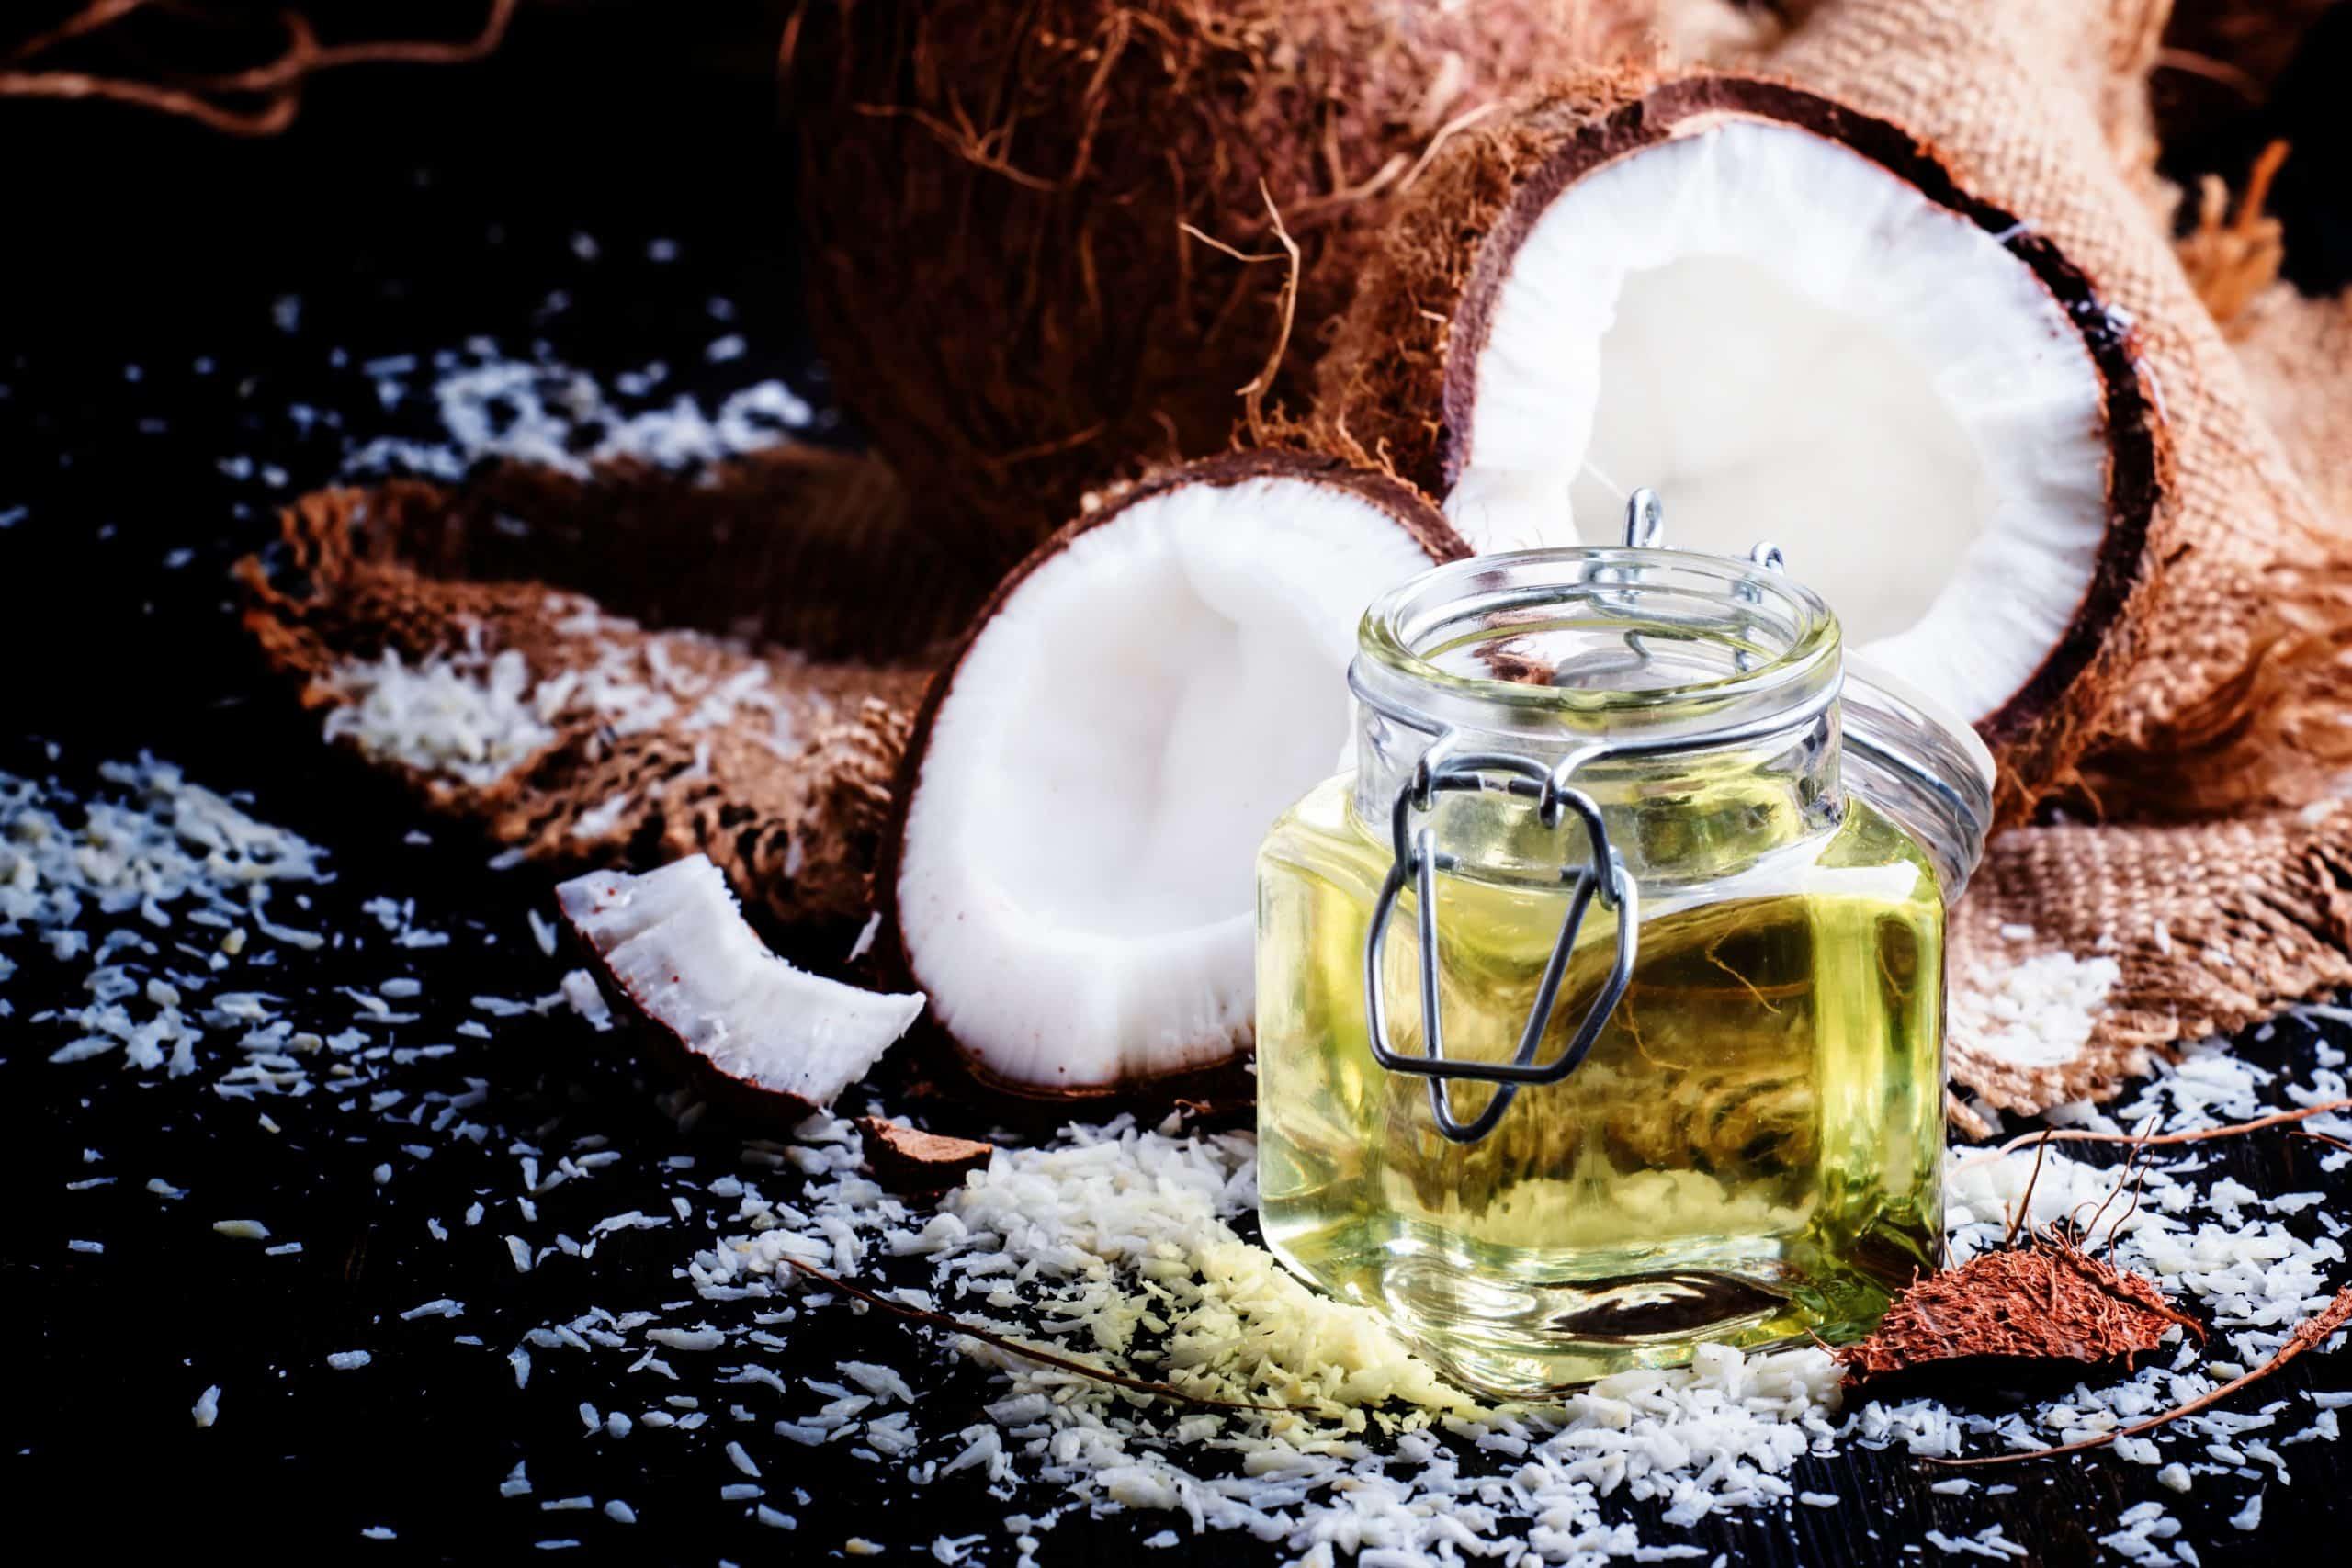 Coconut oil, selective focus